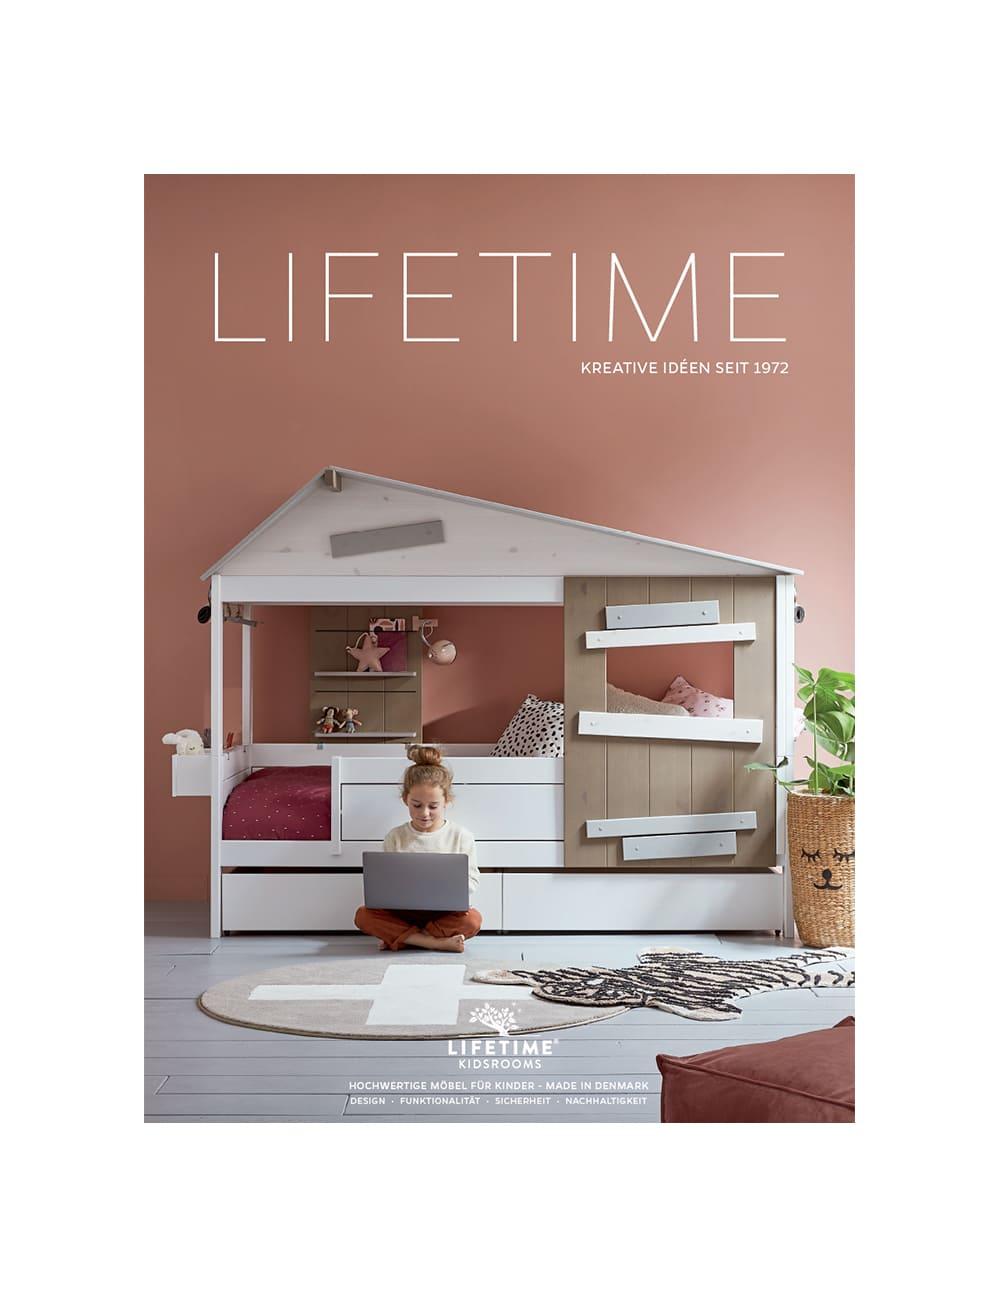 Lifetime Katalog für Kindermöbel aus Skandinavien